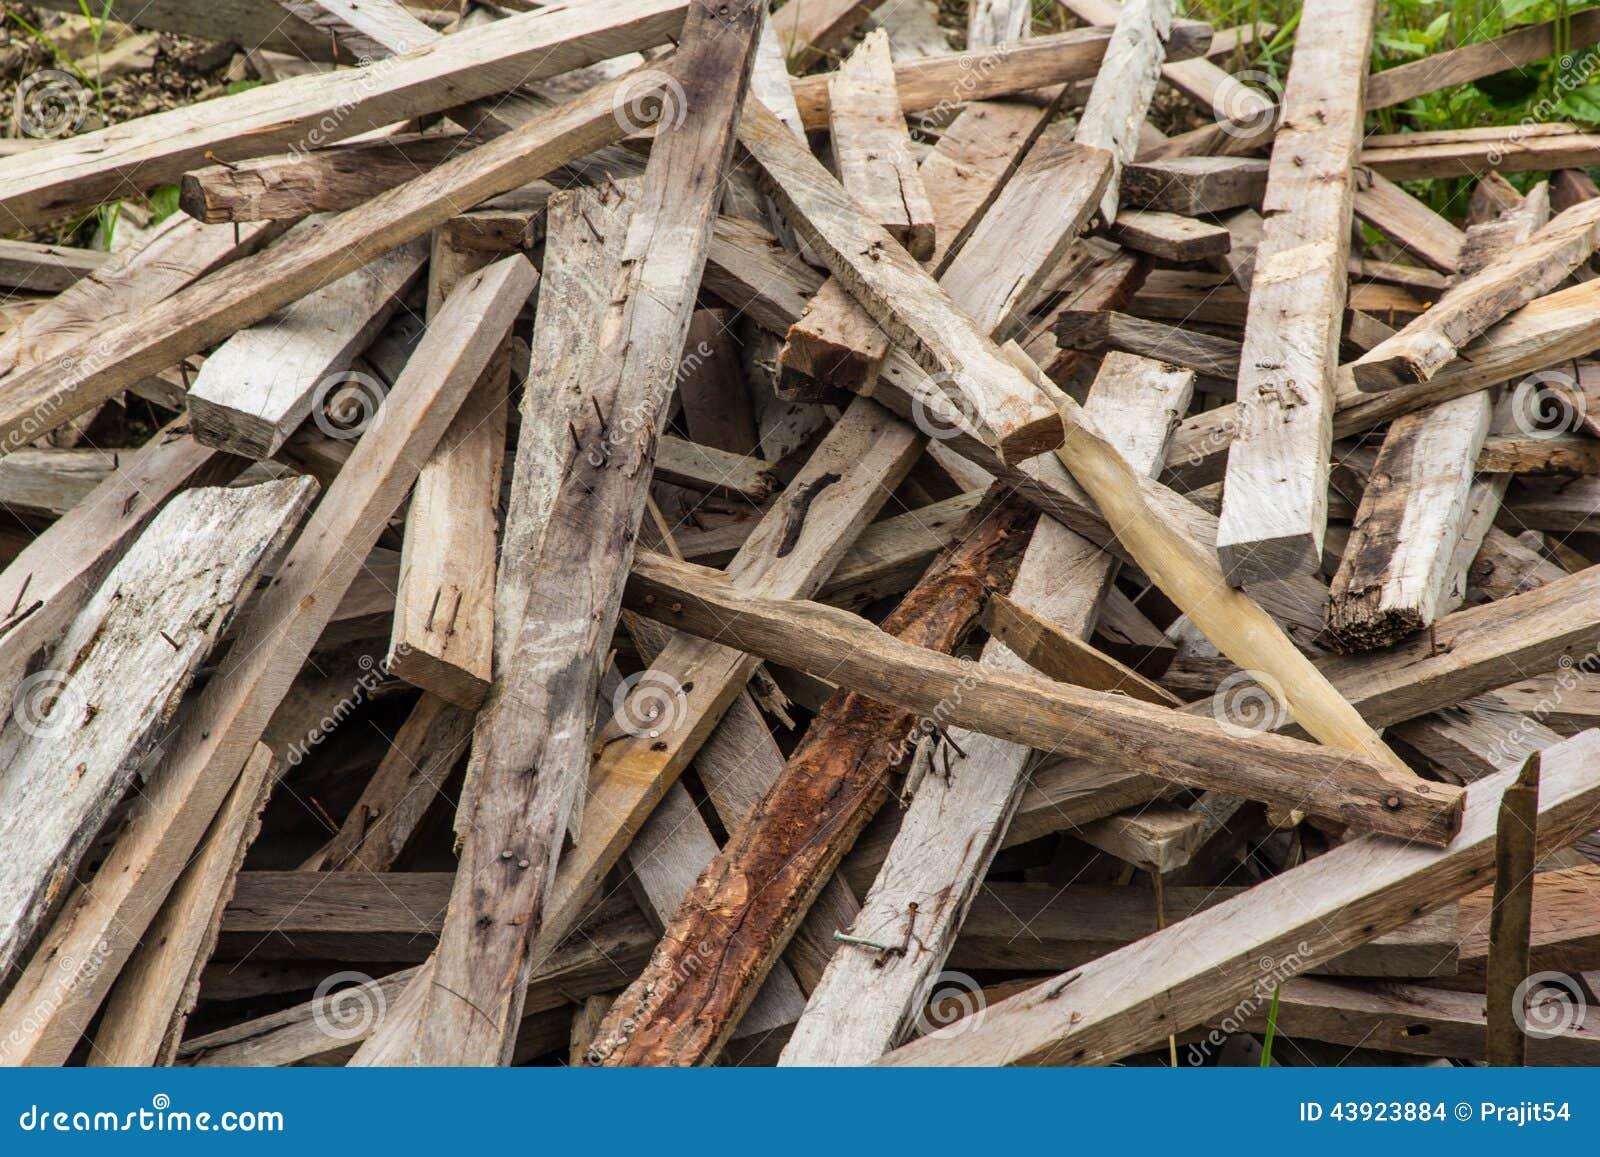 Scrap wood wall art - Scrap Wood Stock Photo Image 43923884